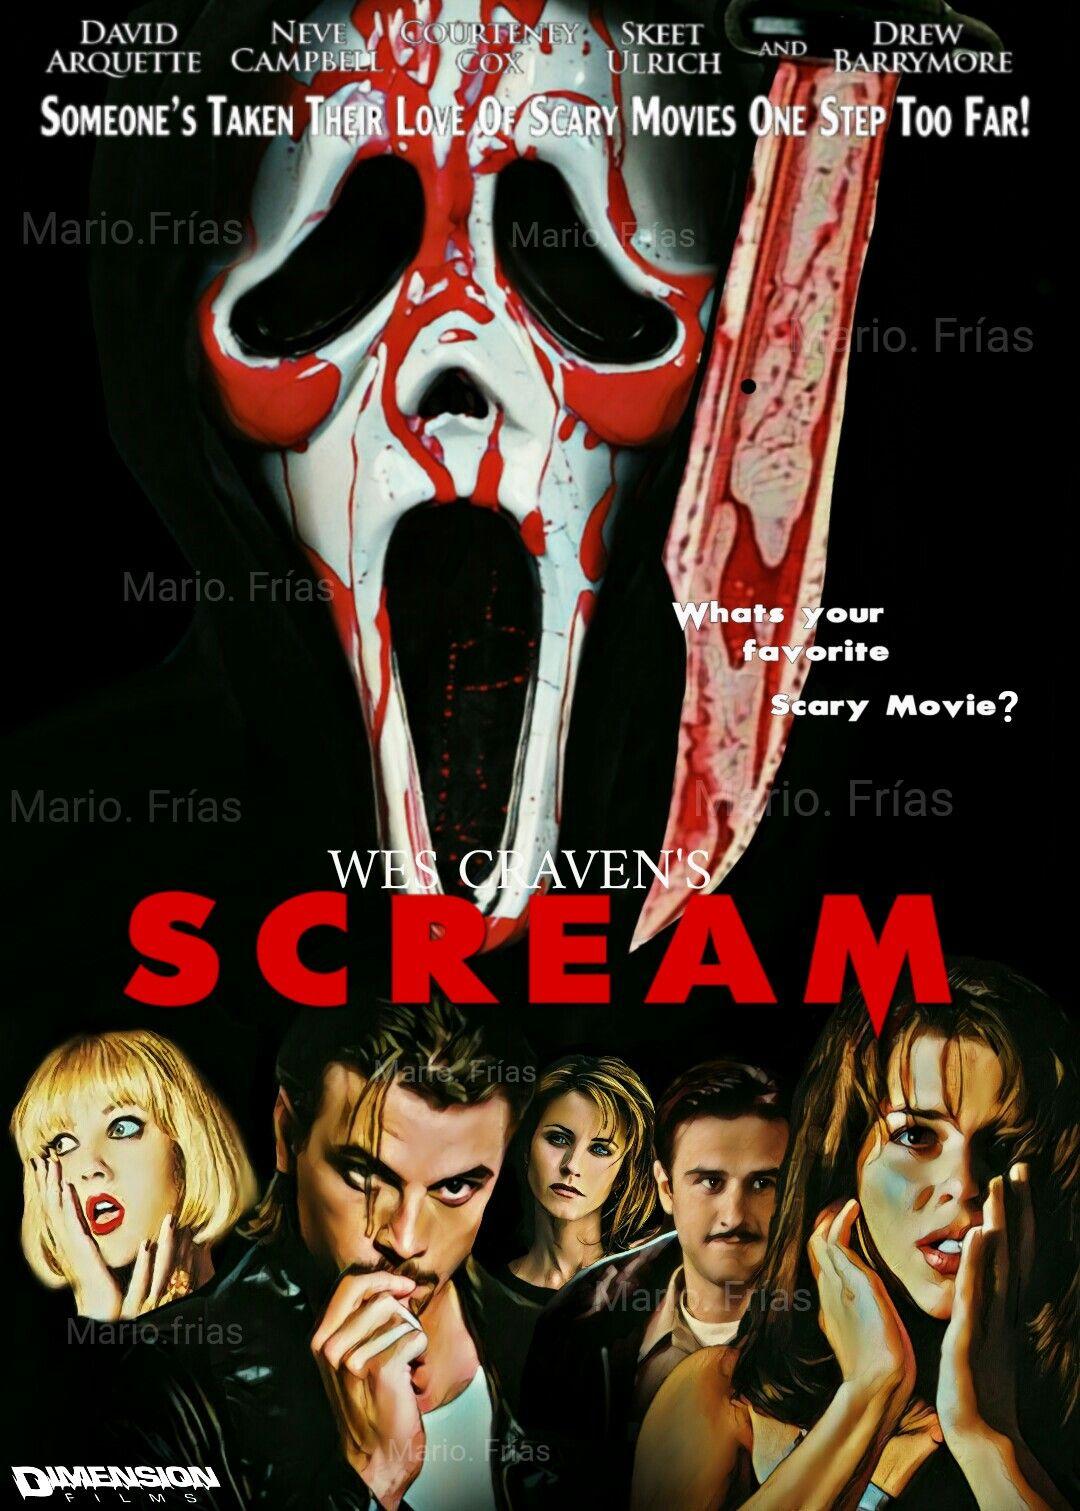 scream wes craven horror movie slasher fan made edit by mario scream 1996 wes craven horror movie slasher fan made edit by mario friacuteas